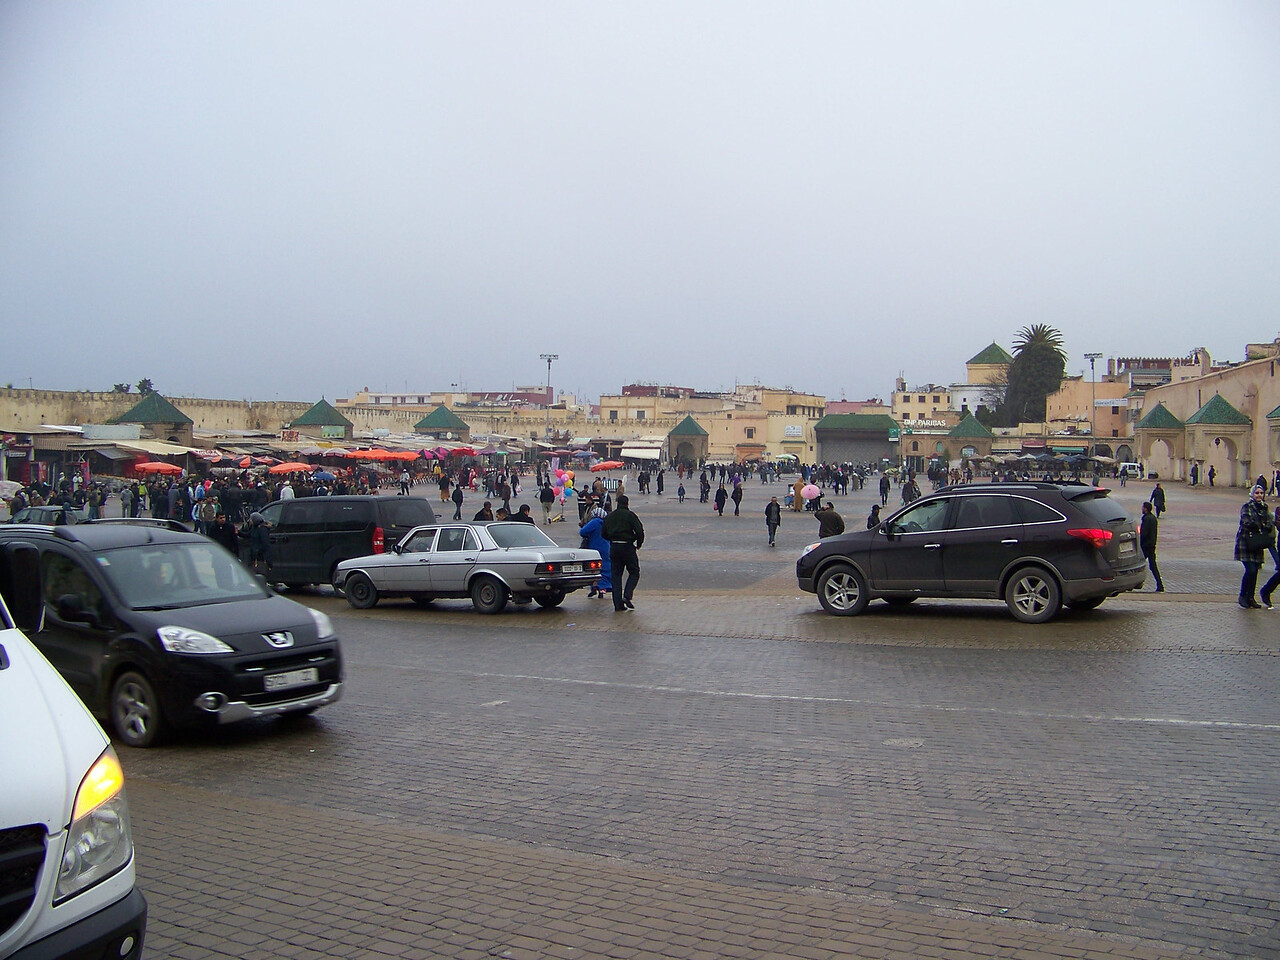 0039 - El-Hdim Square - Meknes Morocco.JPG